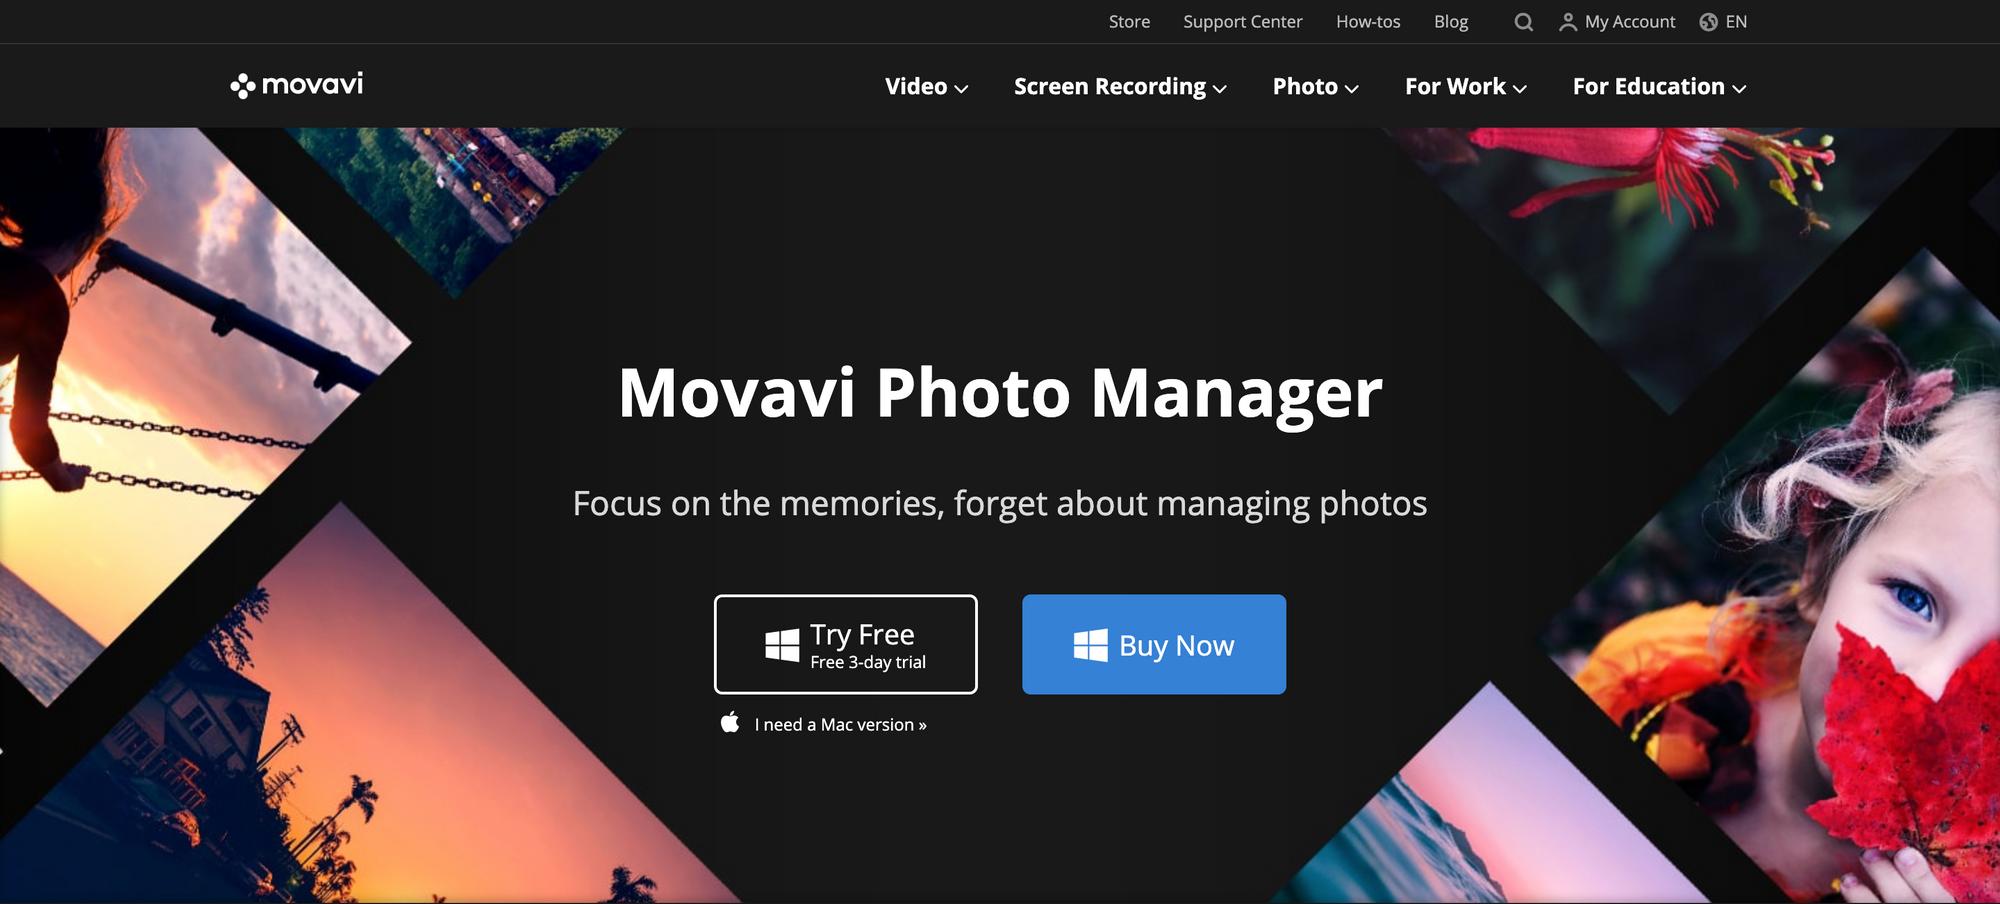 Movavi Photo Manager interface